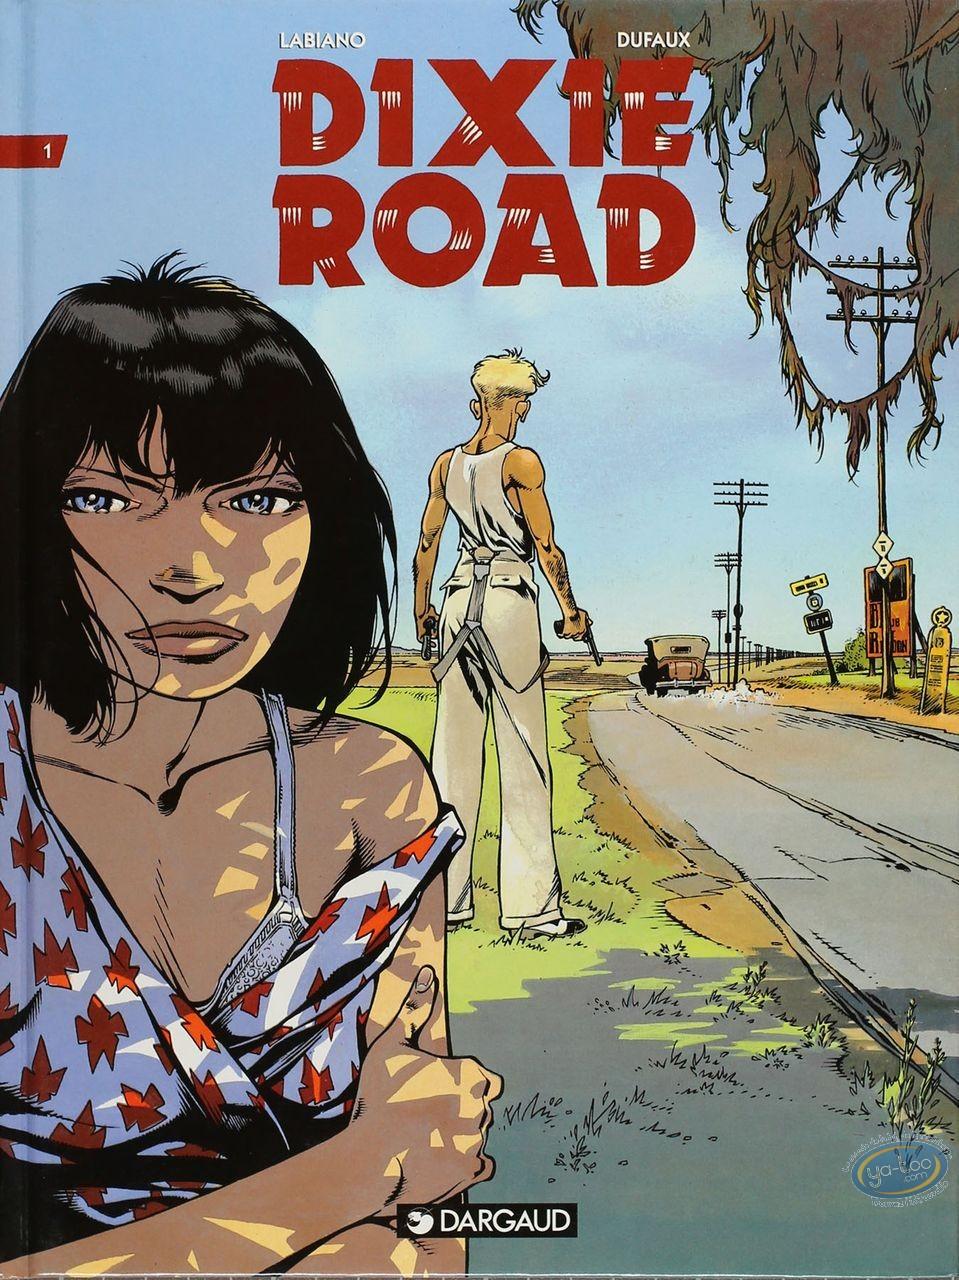 Listed European Comic Books, Dixie Road : Labiano, Dixie Road